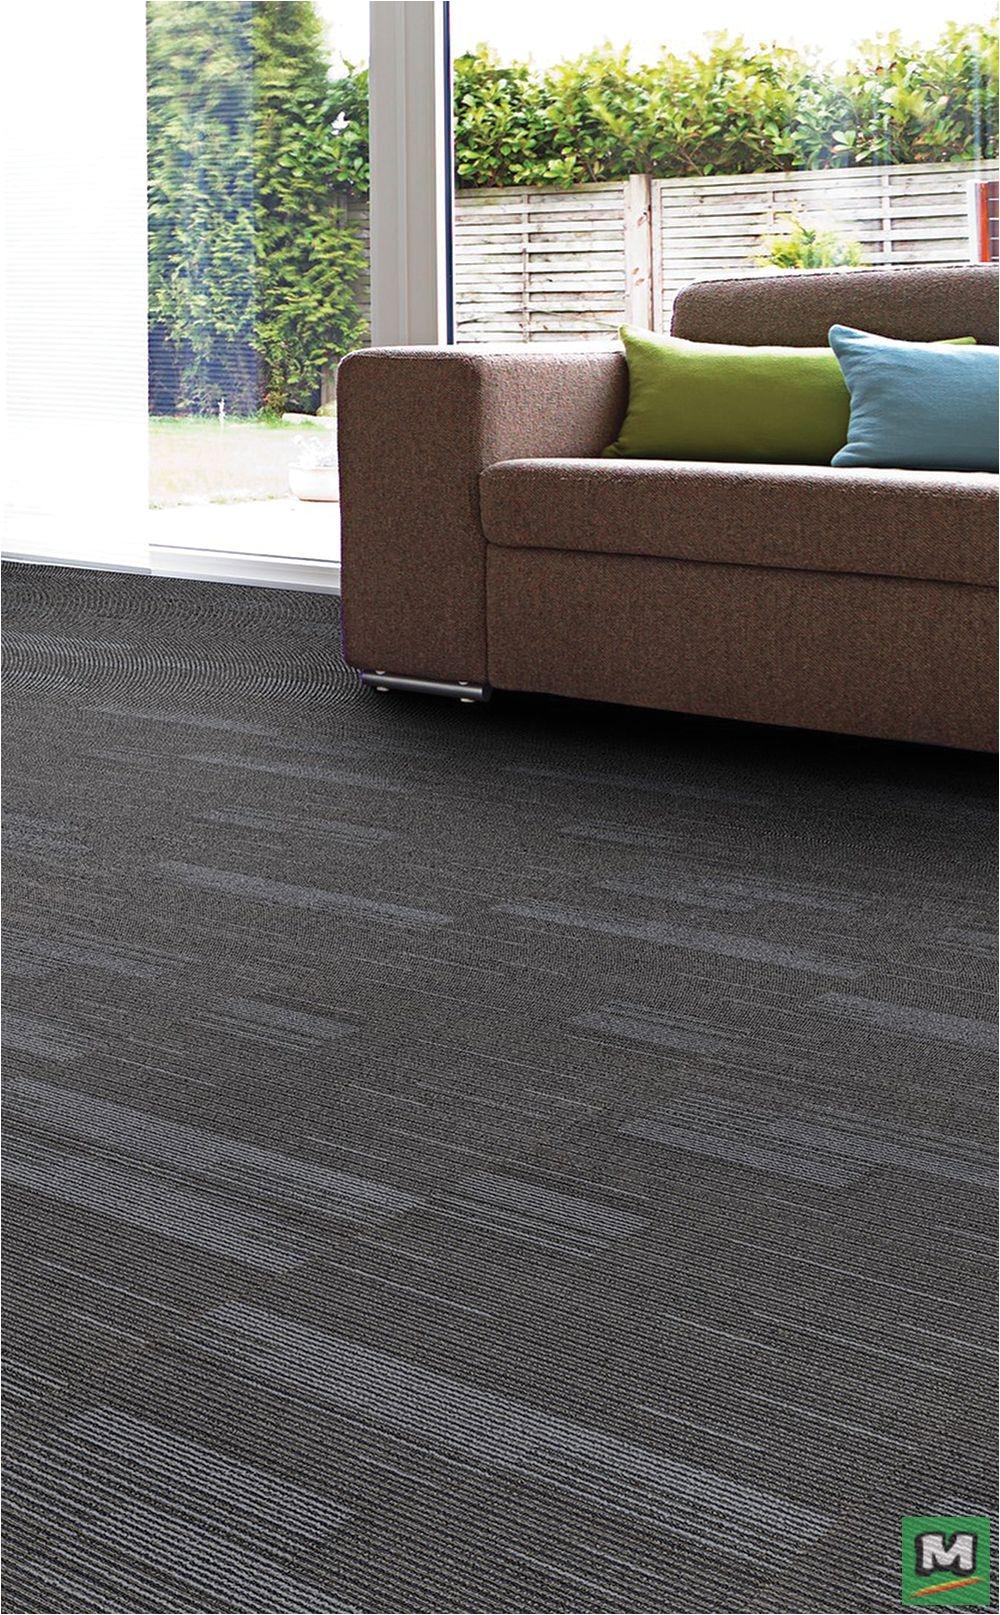 transform the look of an entire room with u tilea loft modular carpet tile